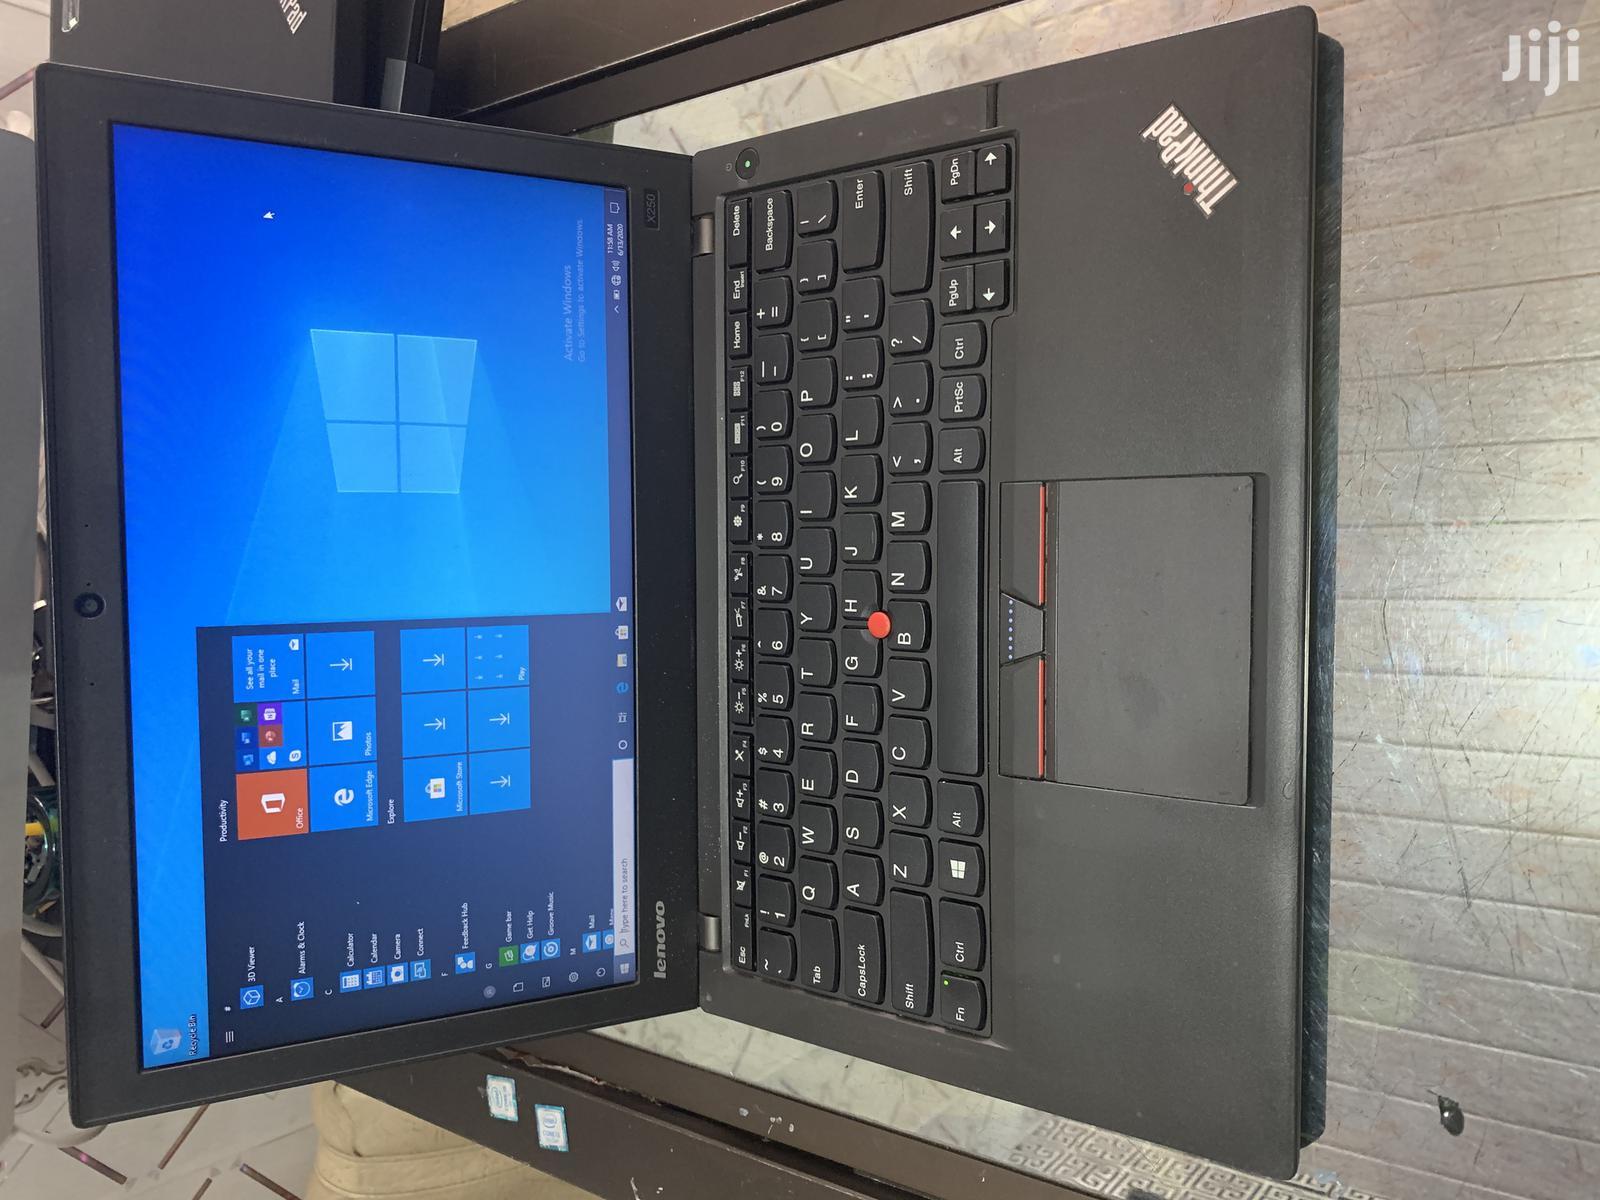 Laptop Lenovo ThinkPad X250 8GB Intel Core I5 HDD 500GB